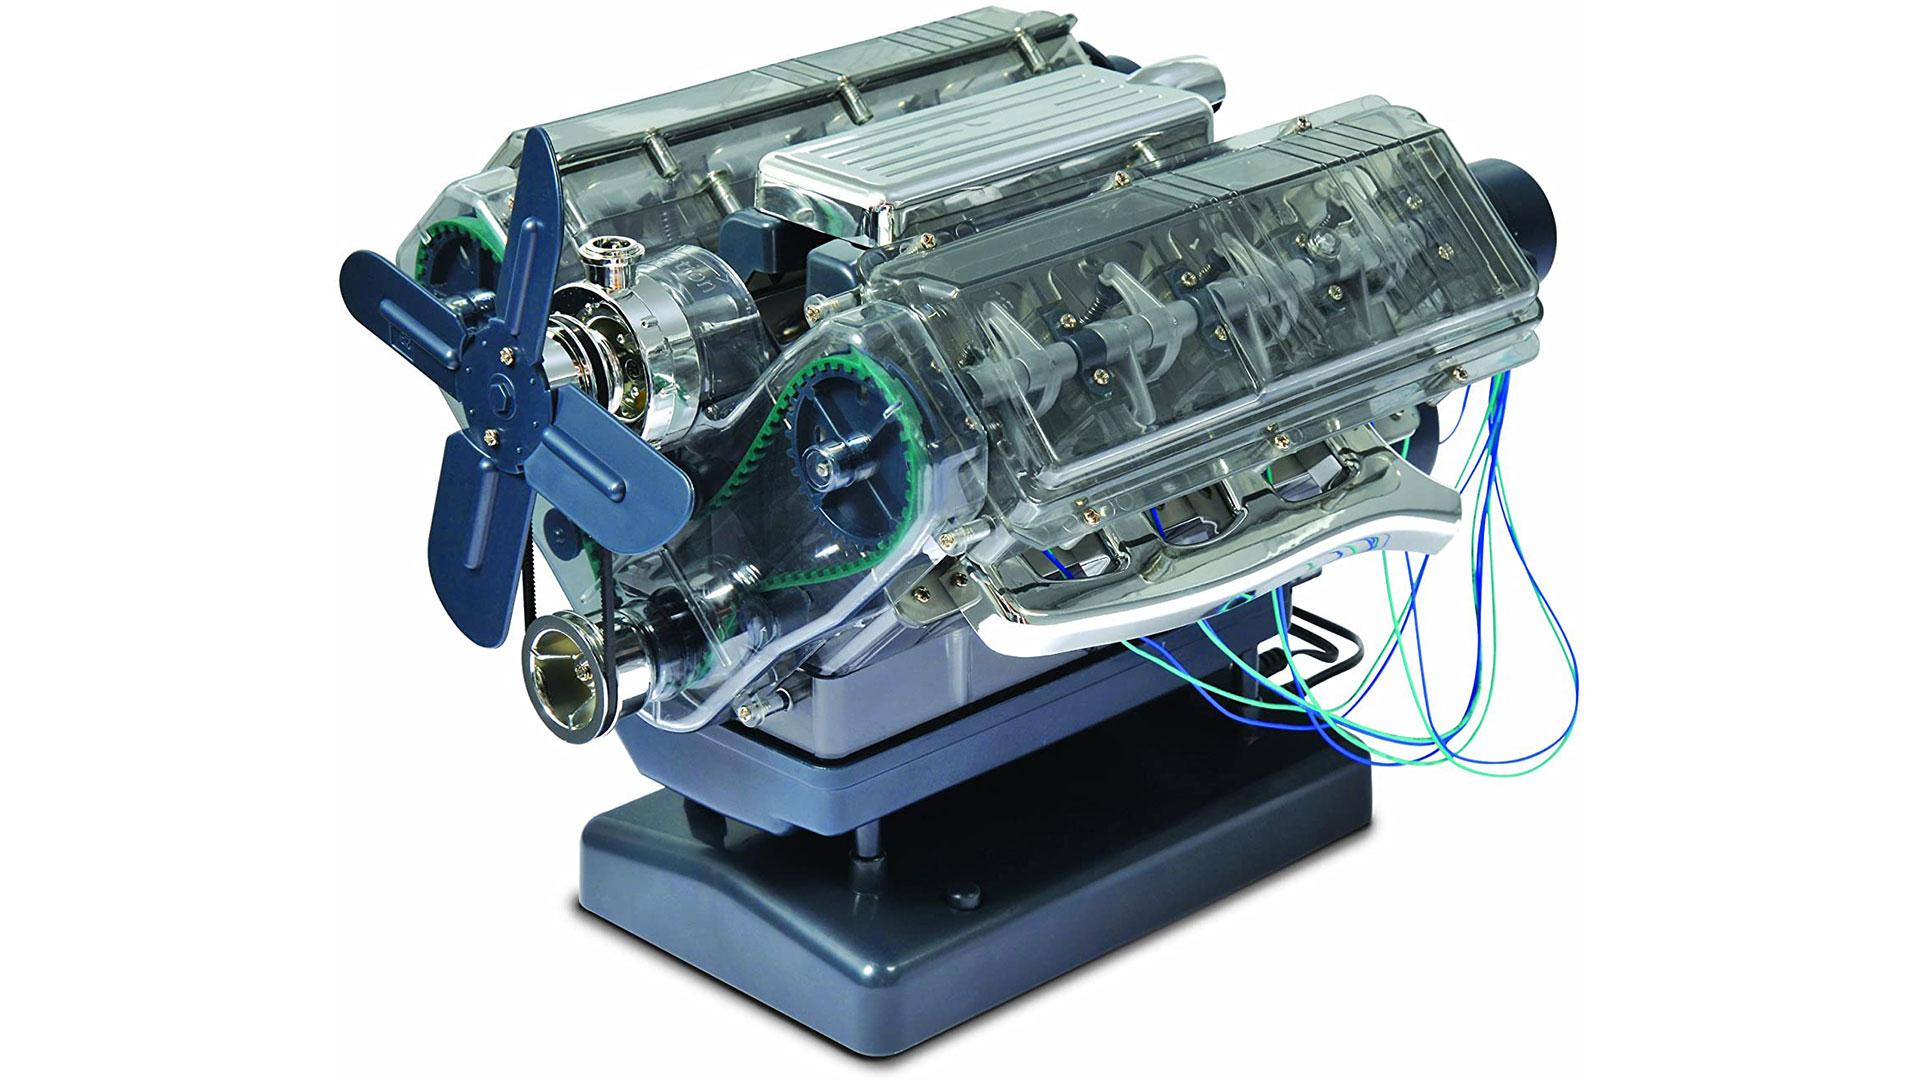 haynes model v8 engine